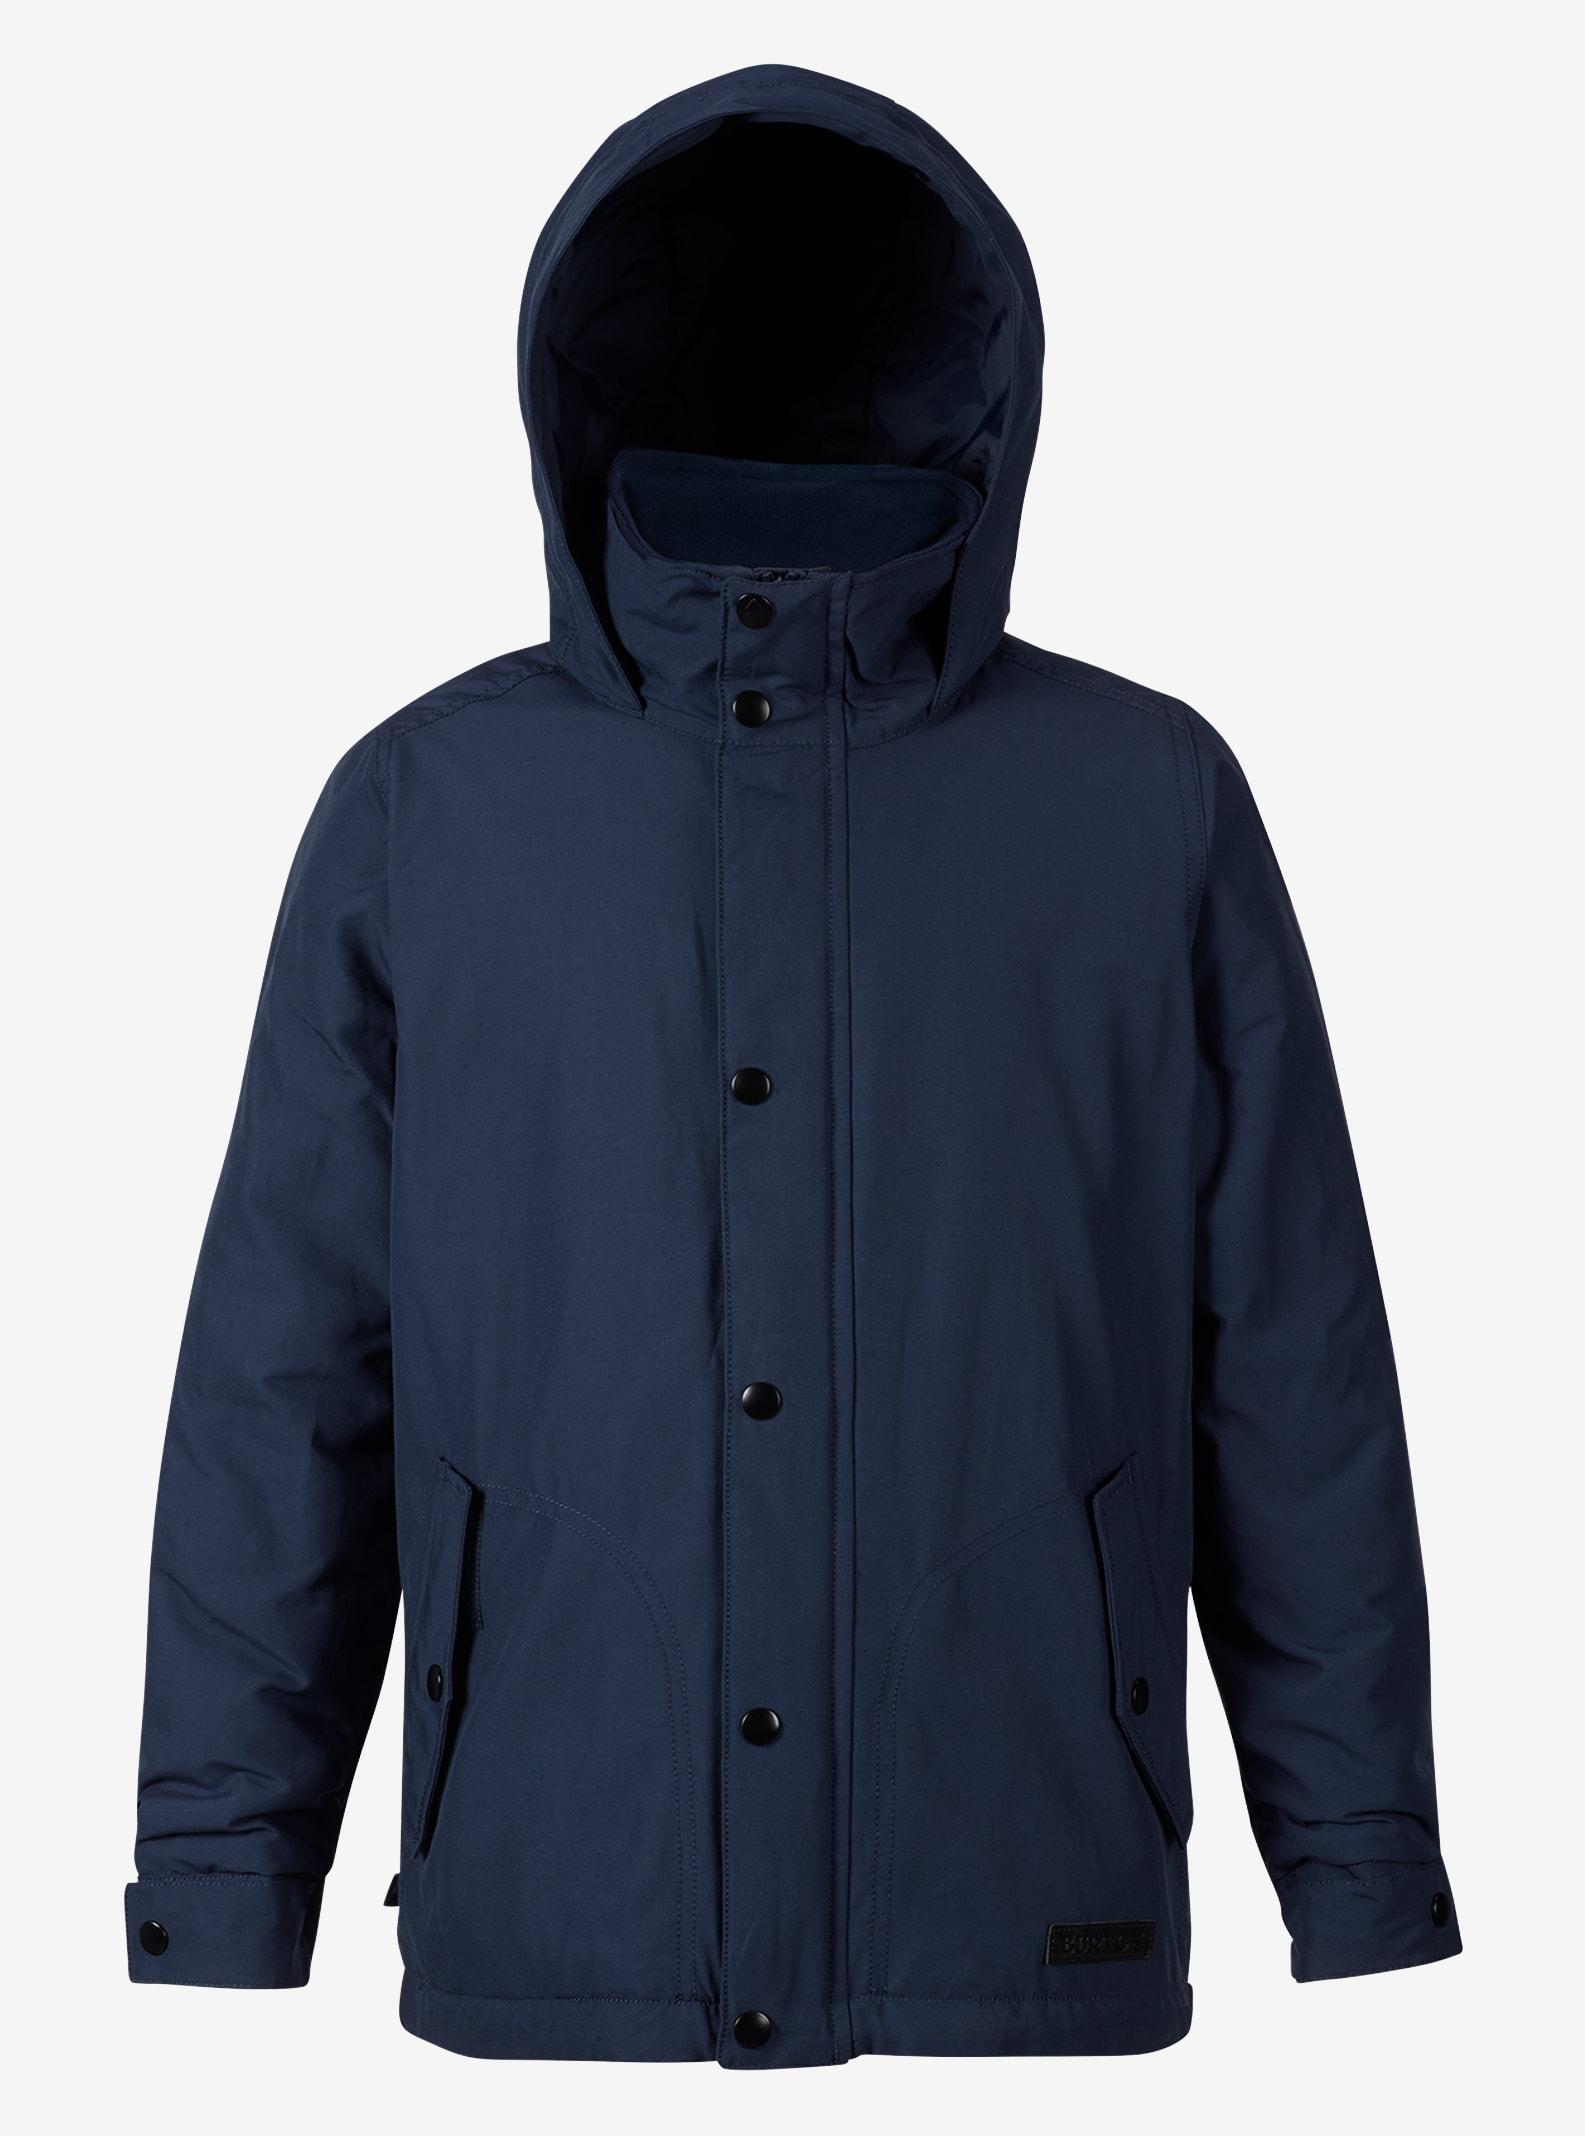 Boys' Burton Dubloon Jacket shown in Mood Indigo